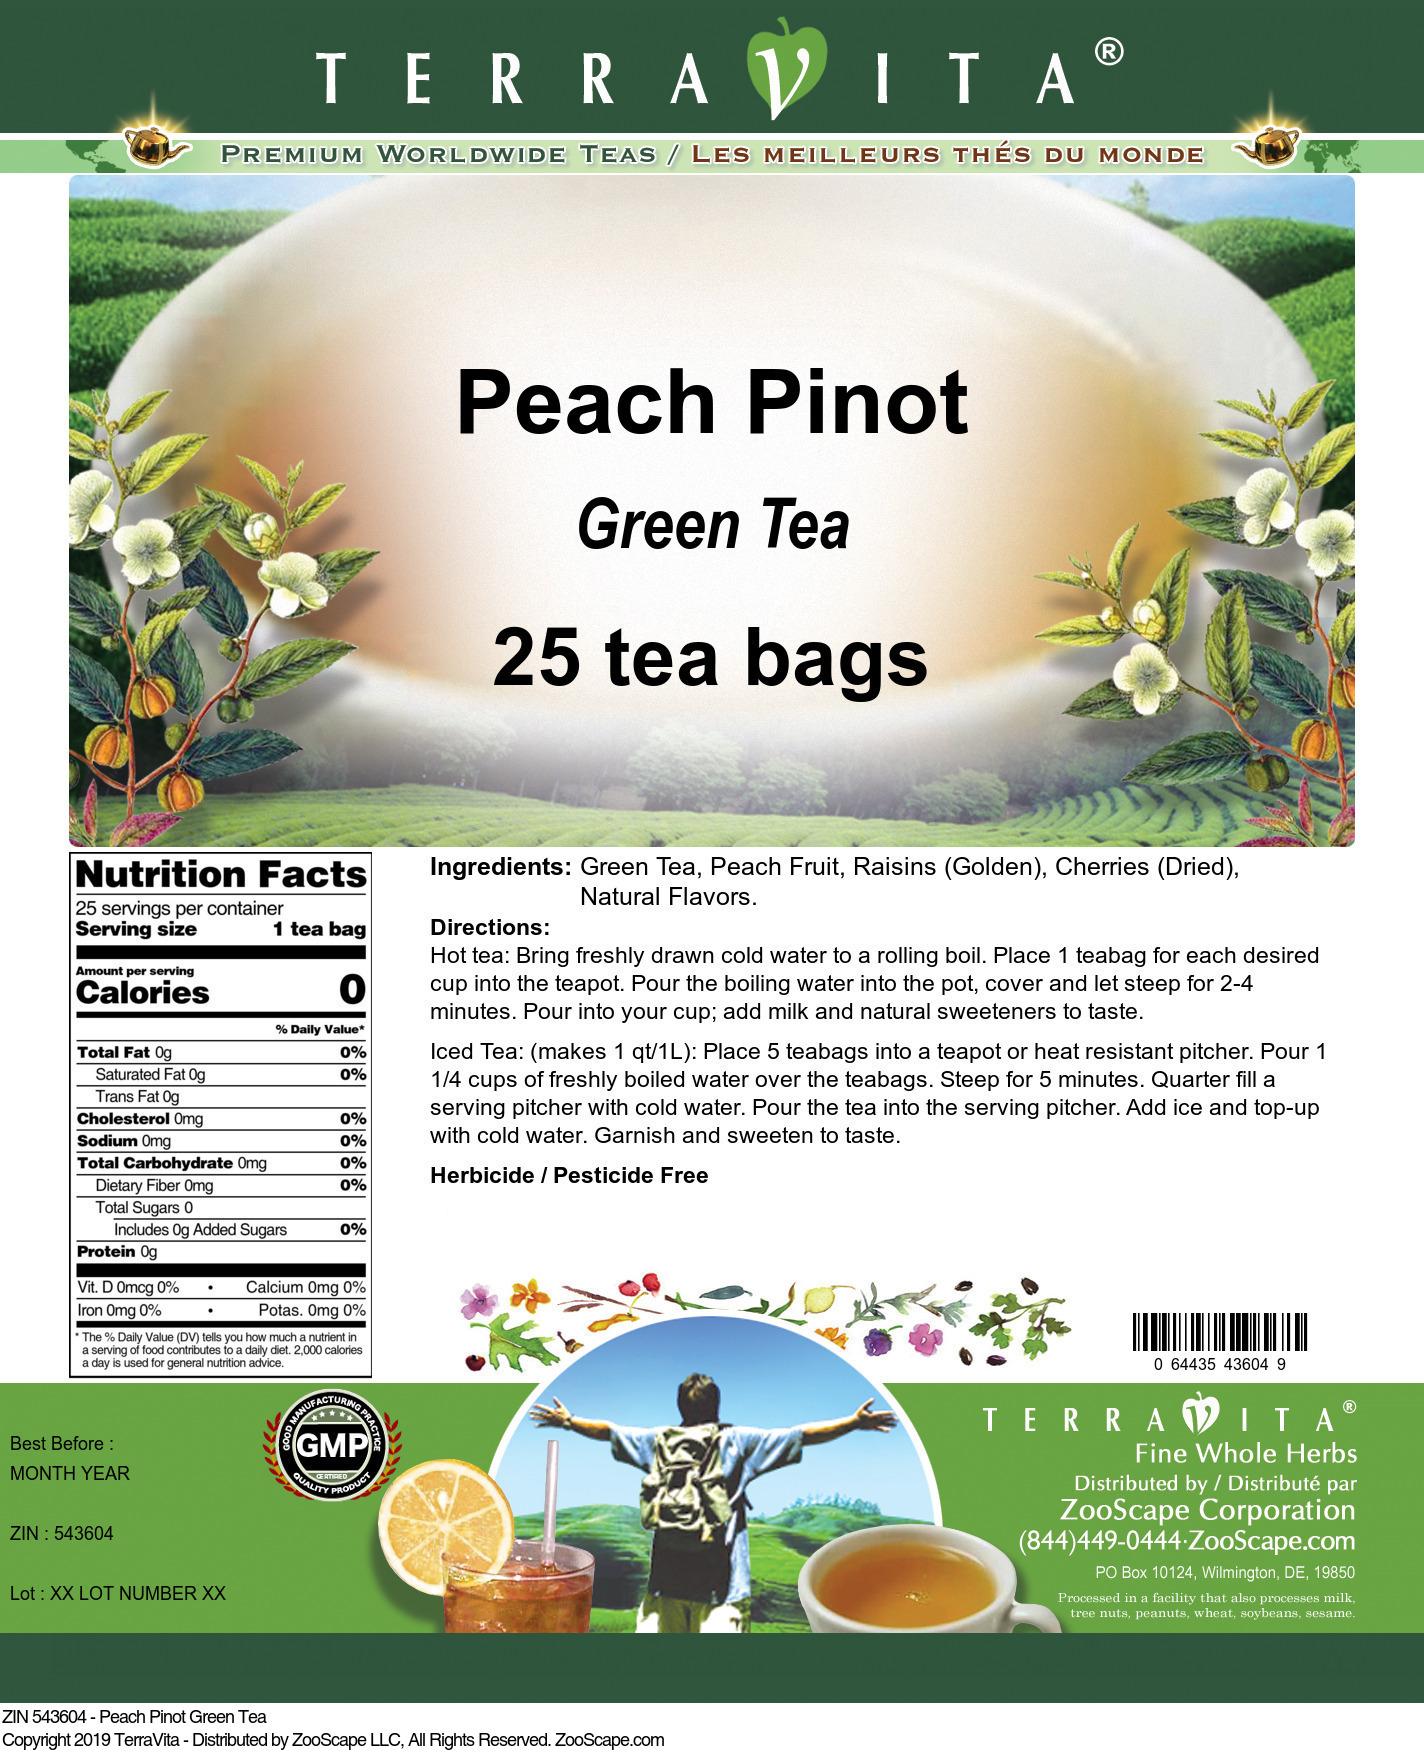 Peach Pinot Green Tea